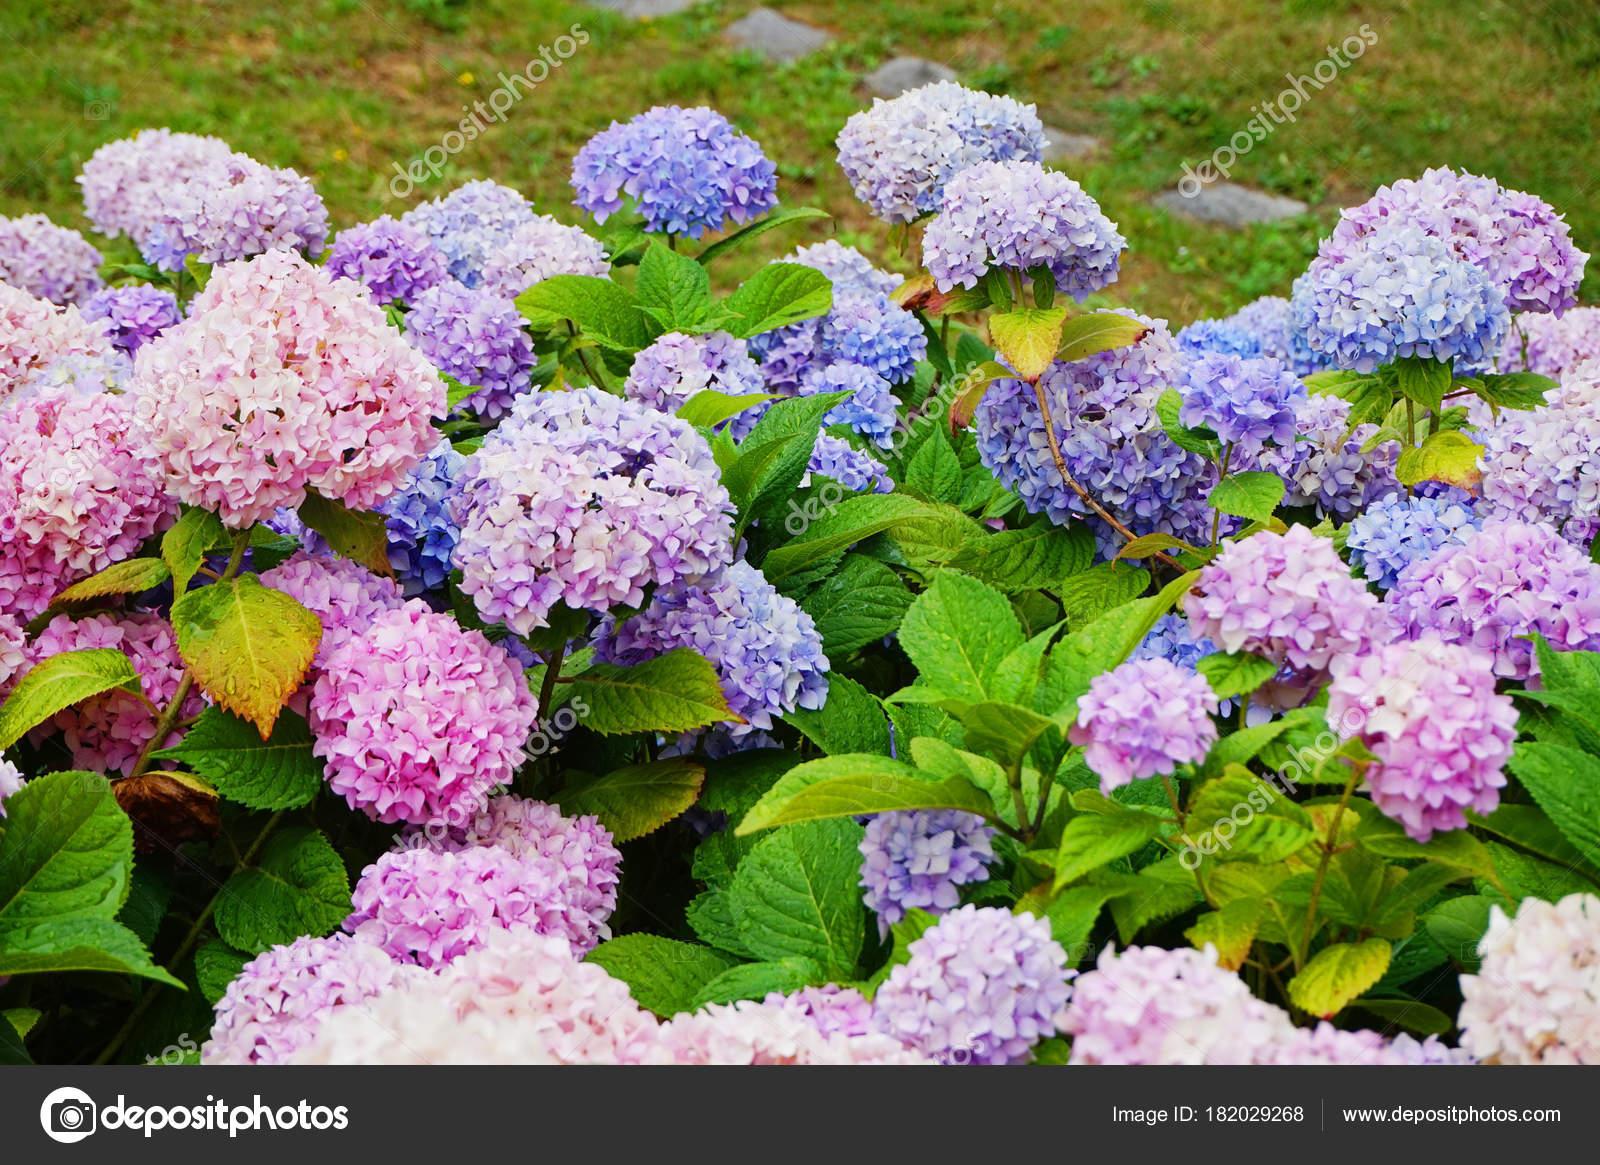 Hortensia Flores Como Fondo Natural Muy Bonito Color Foto De Stock - Color-hortensia